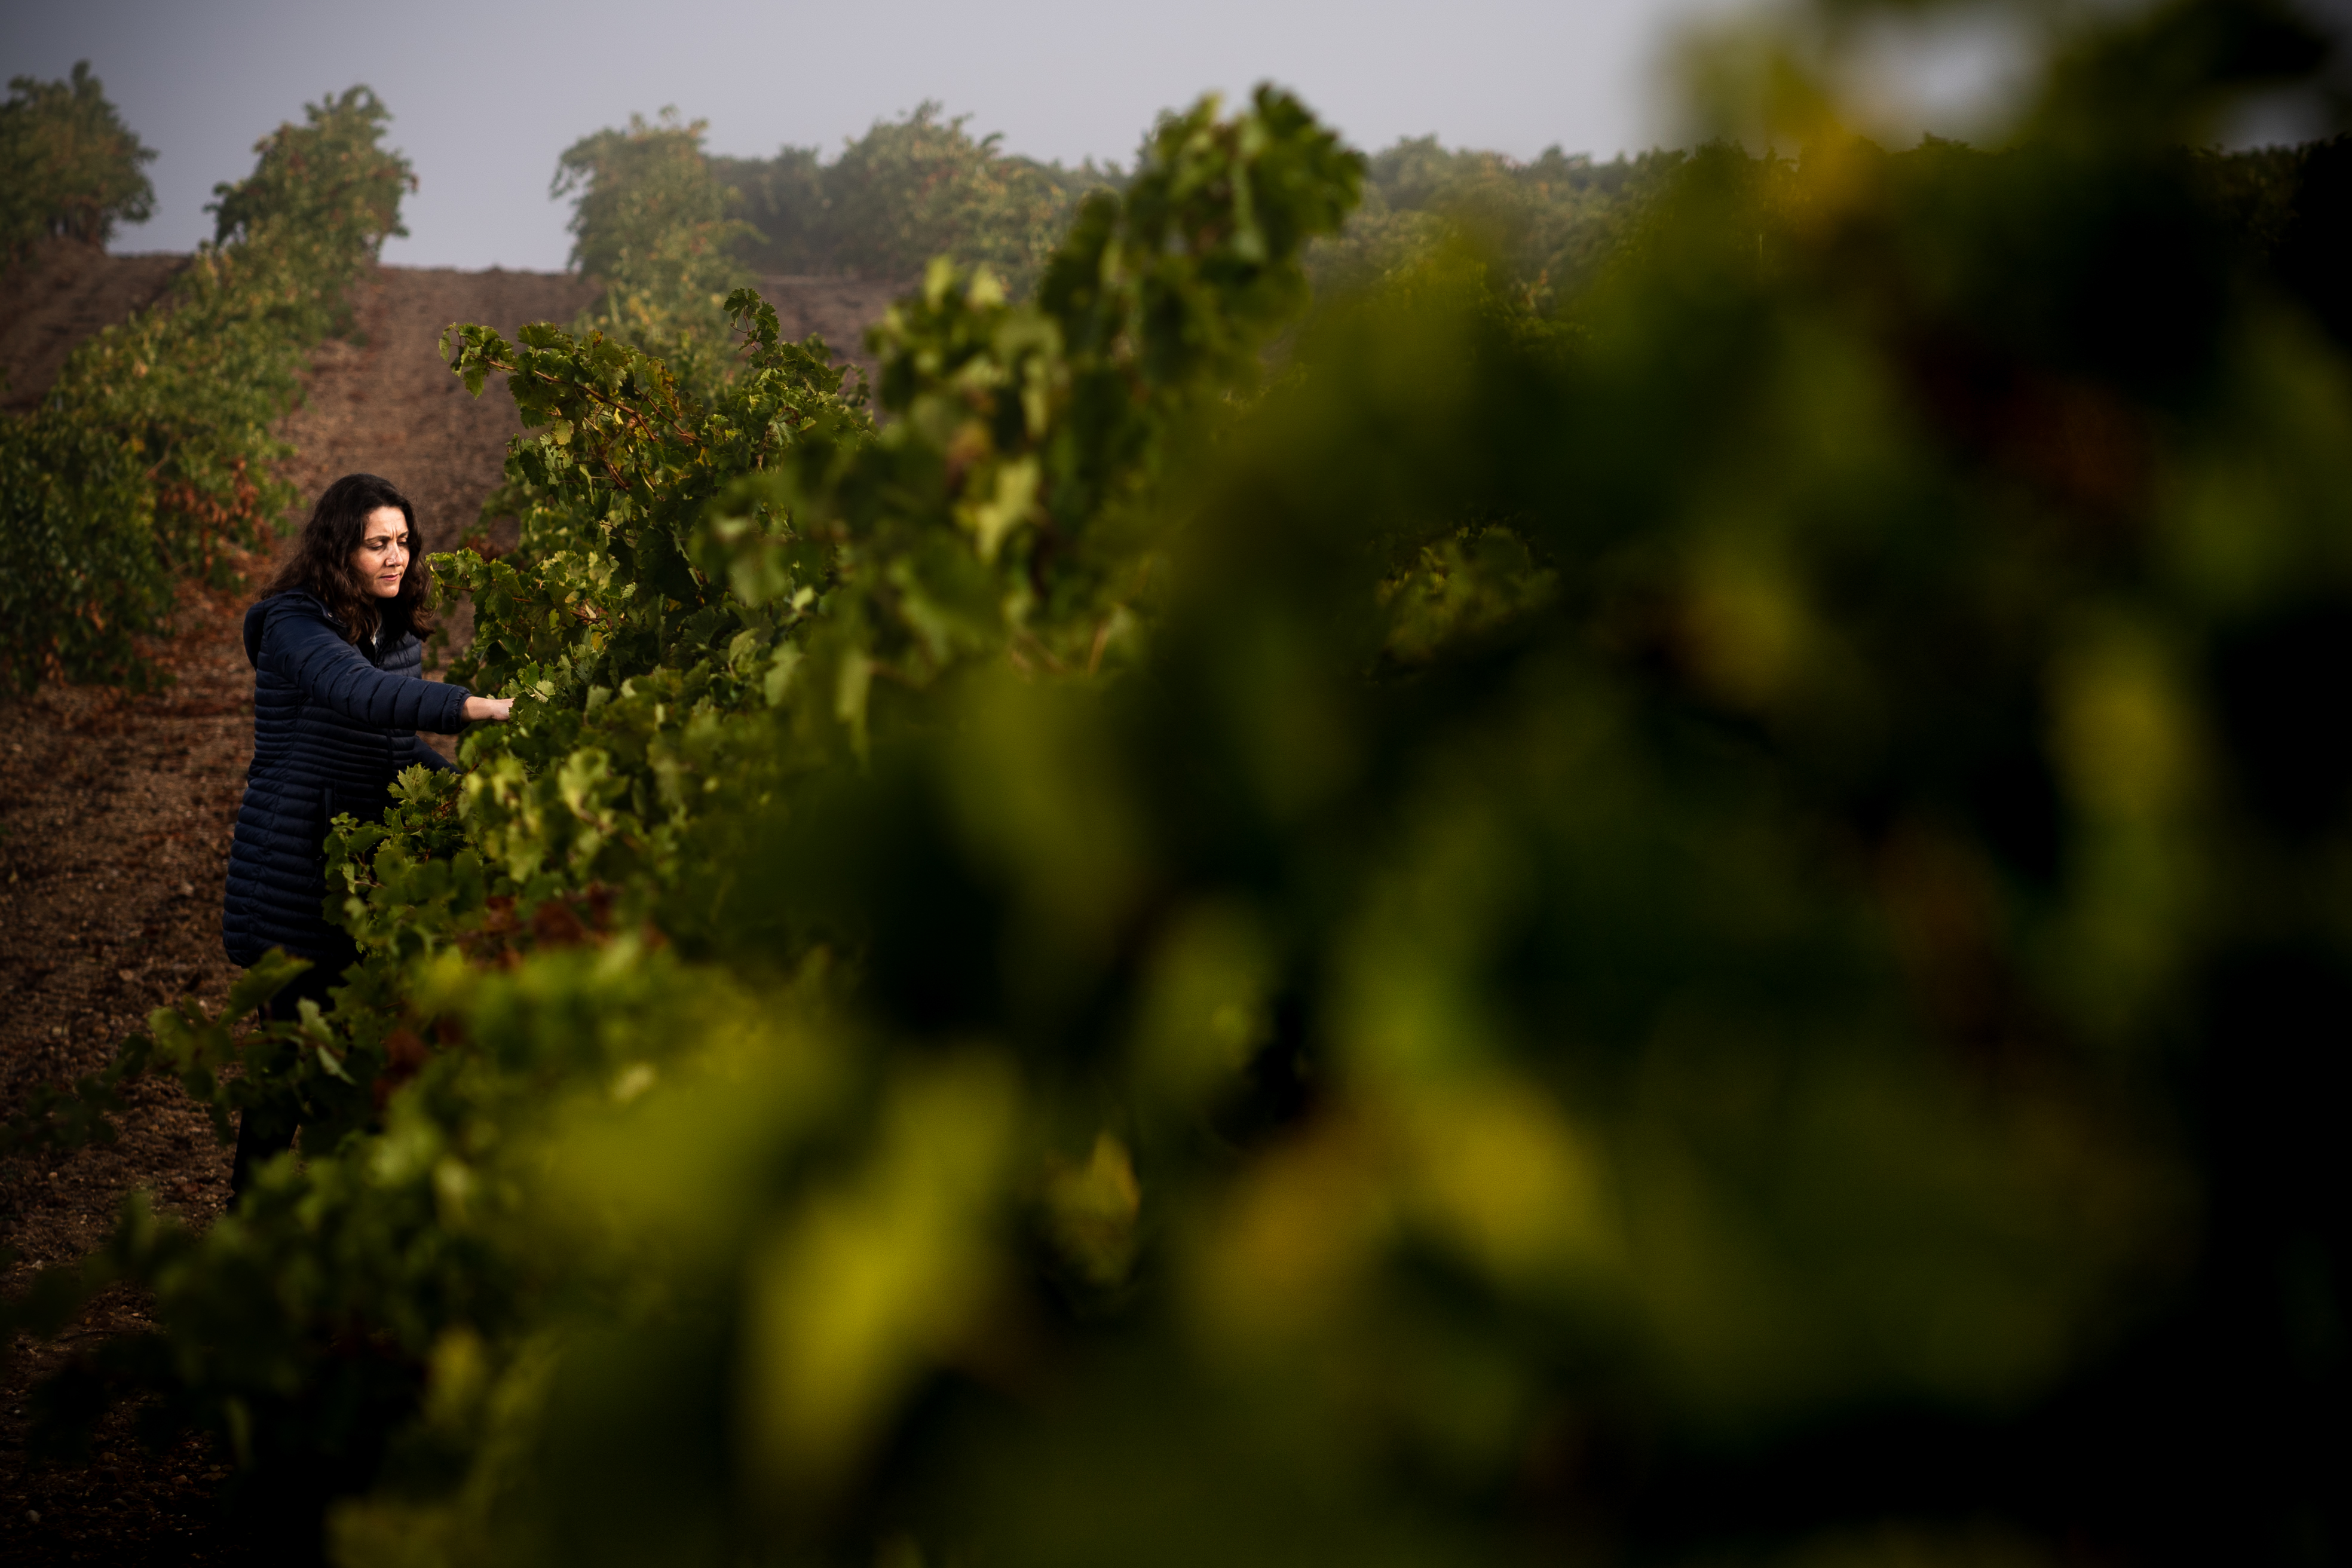 Verdejo – The Green, Green Grape of Spain